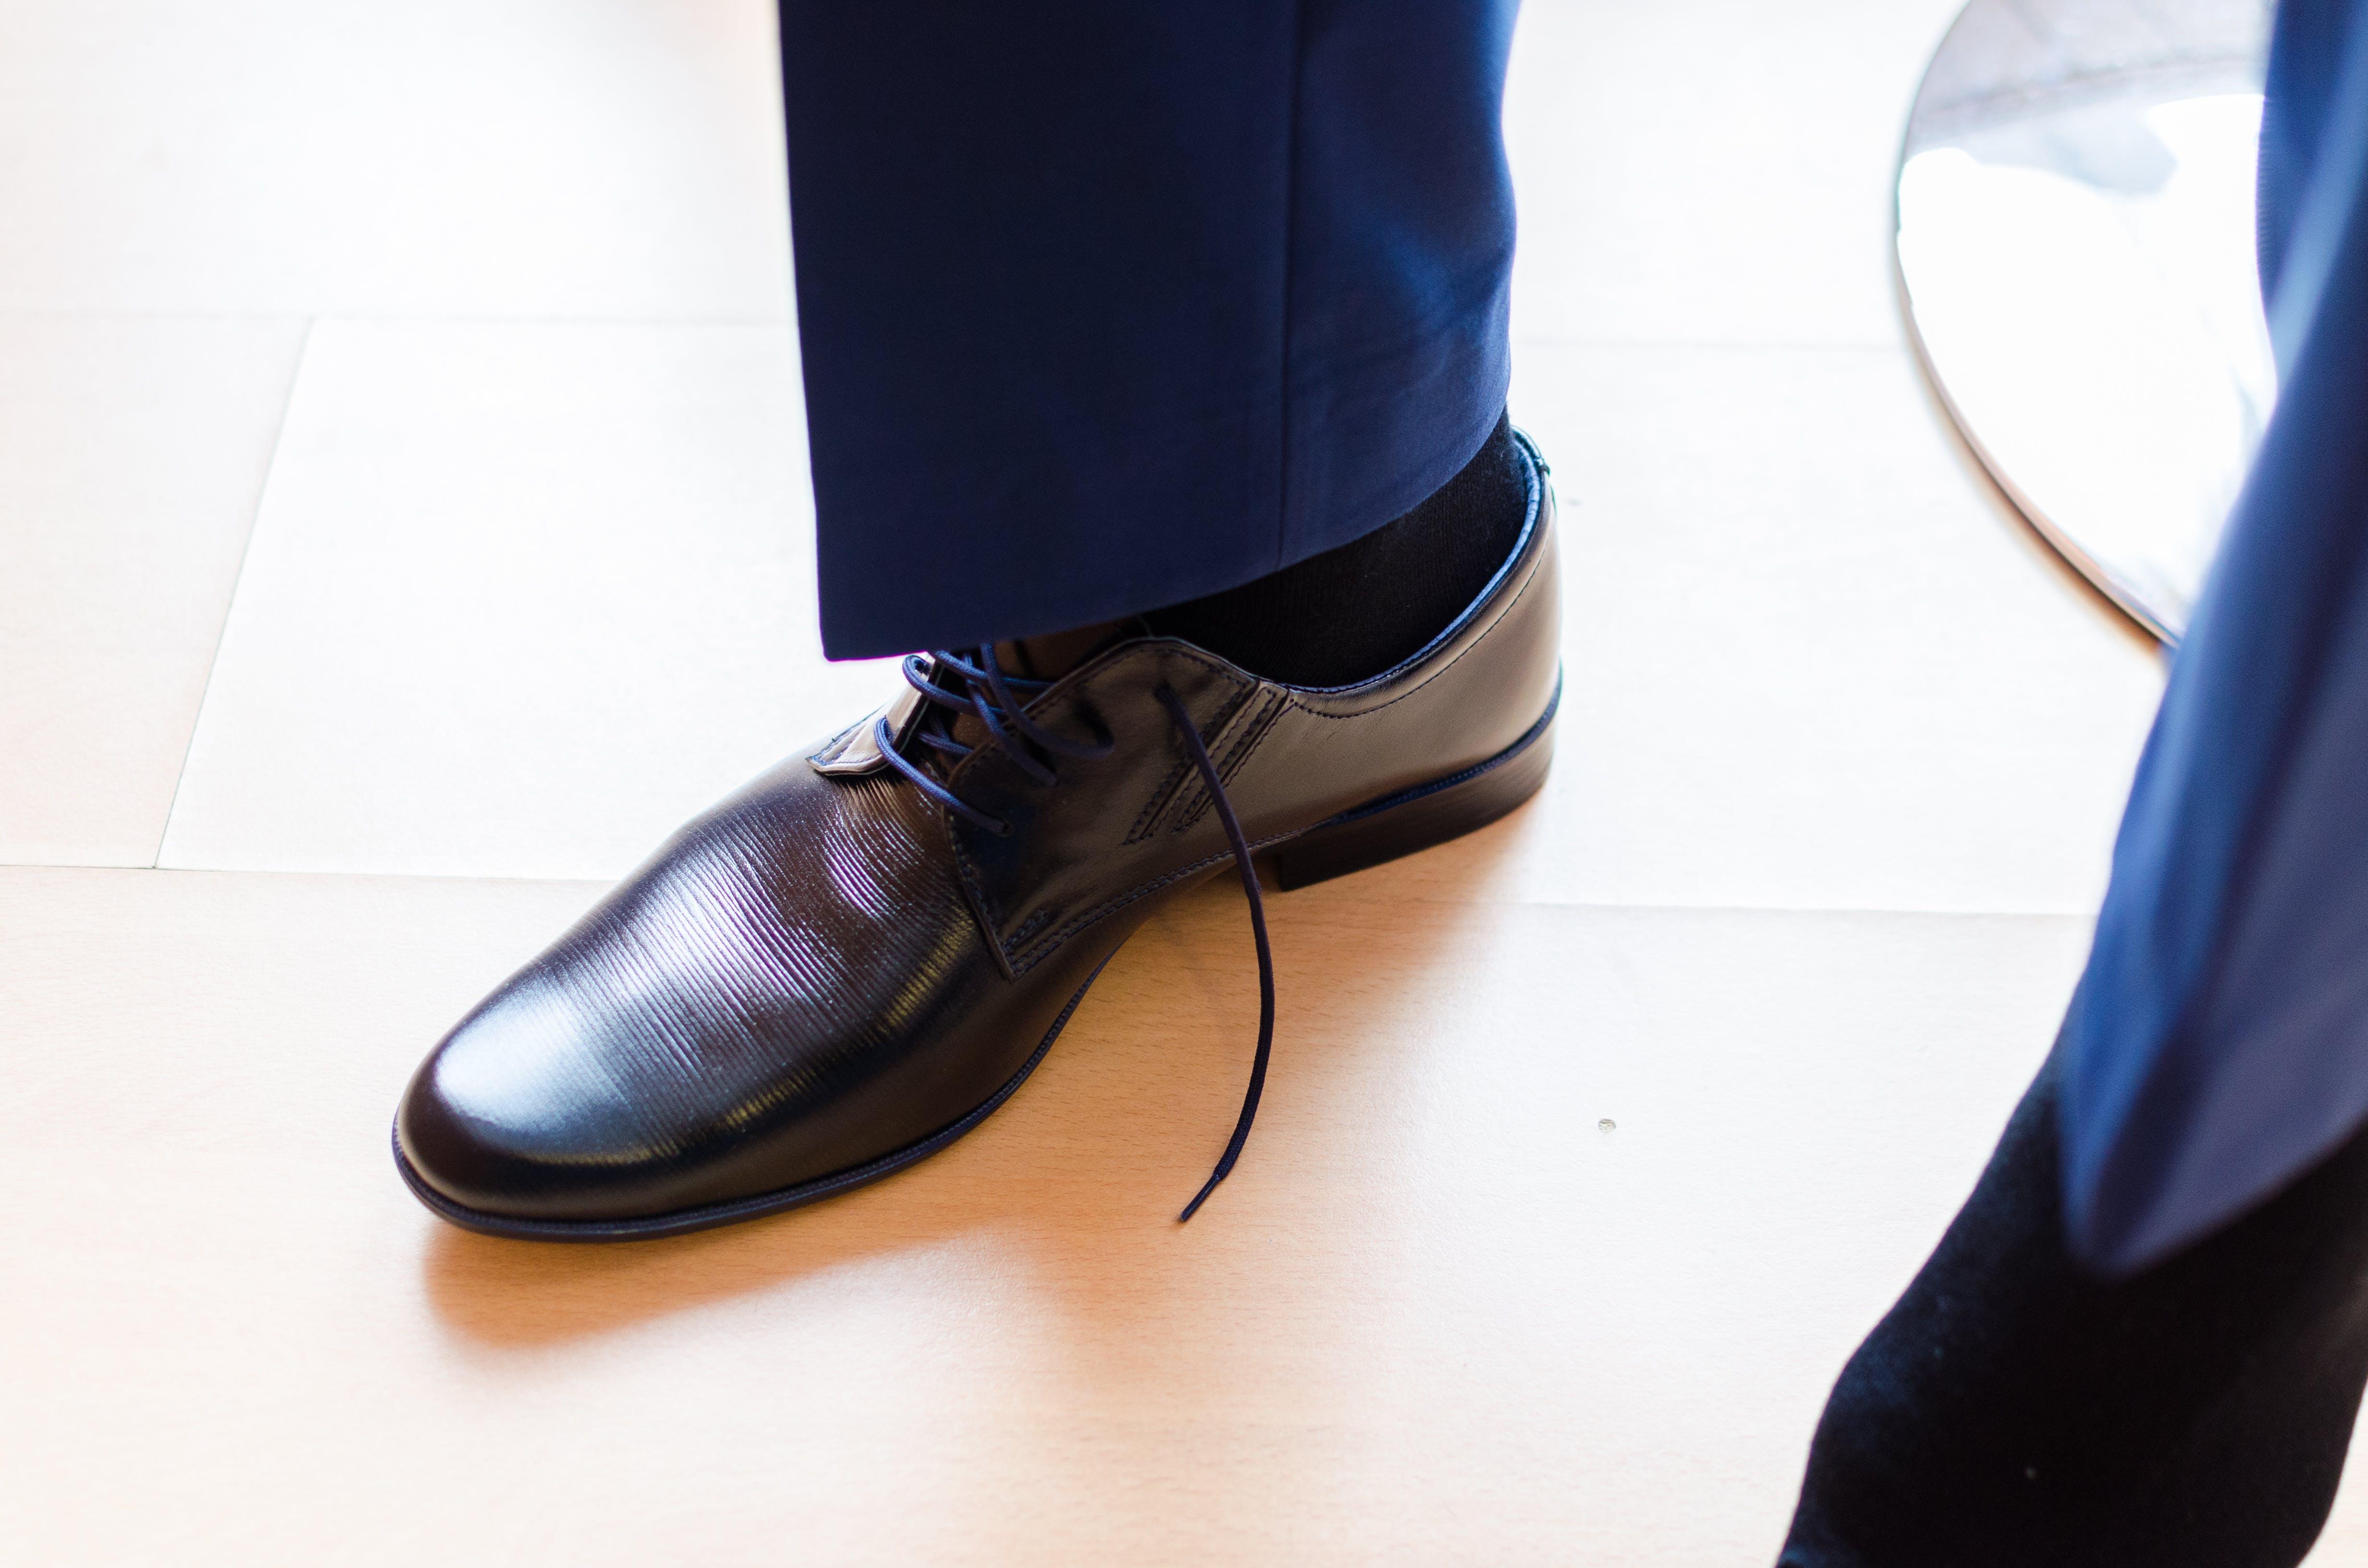 black, blue, boot